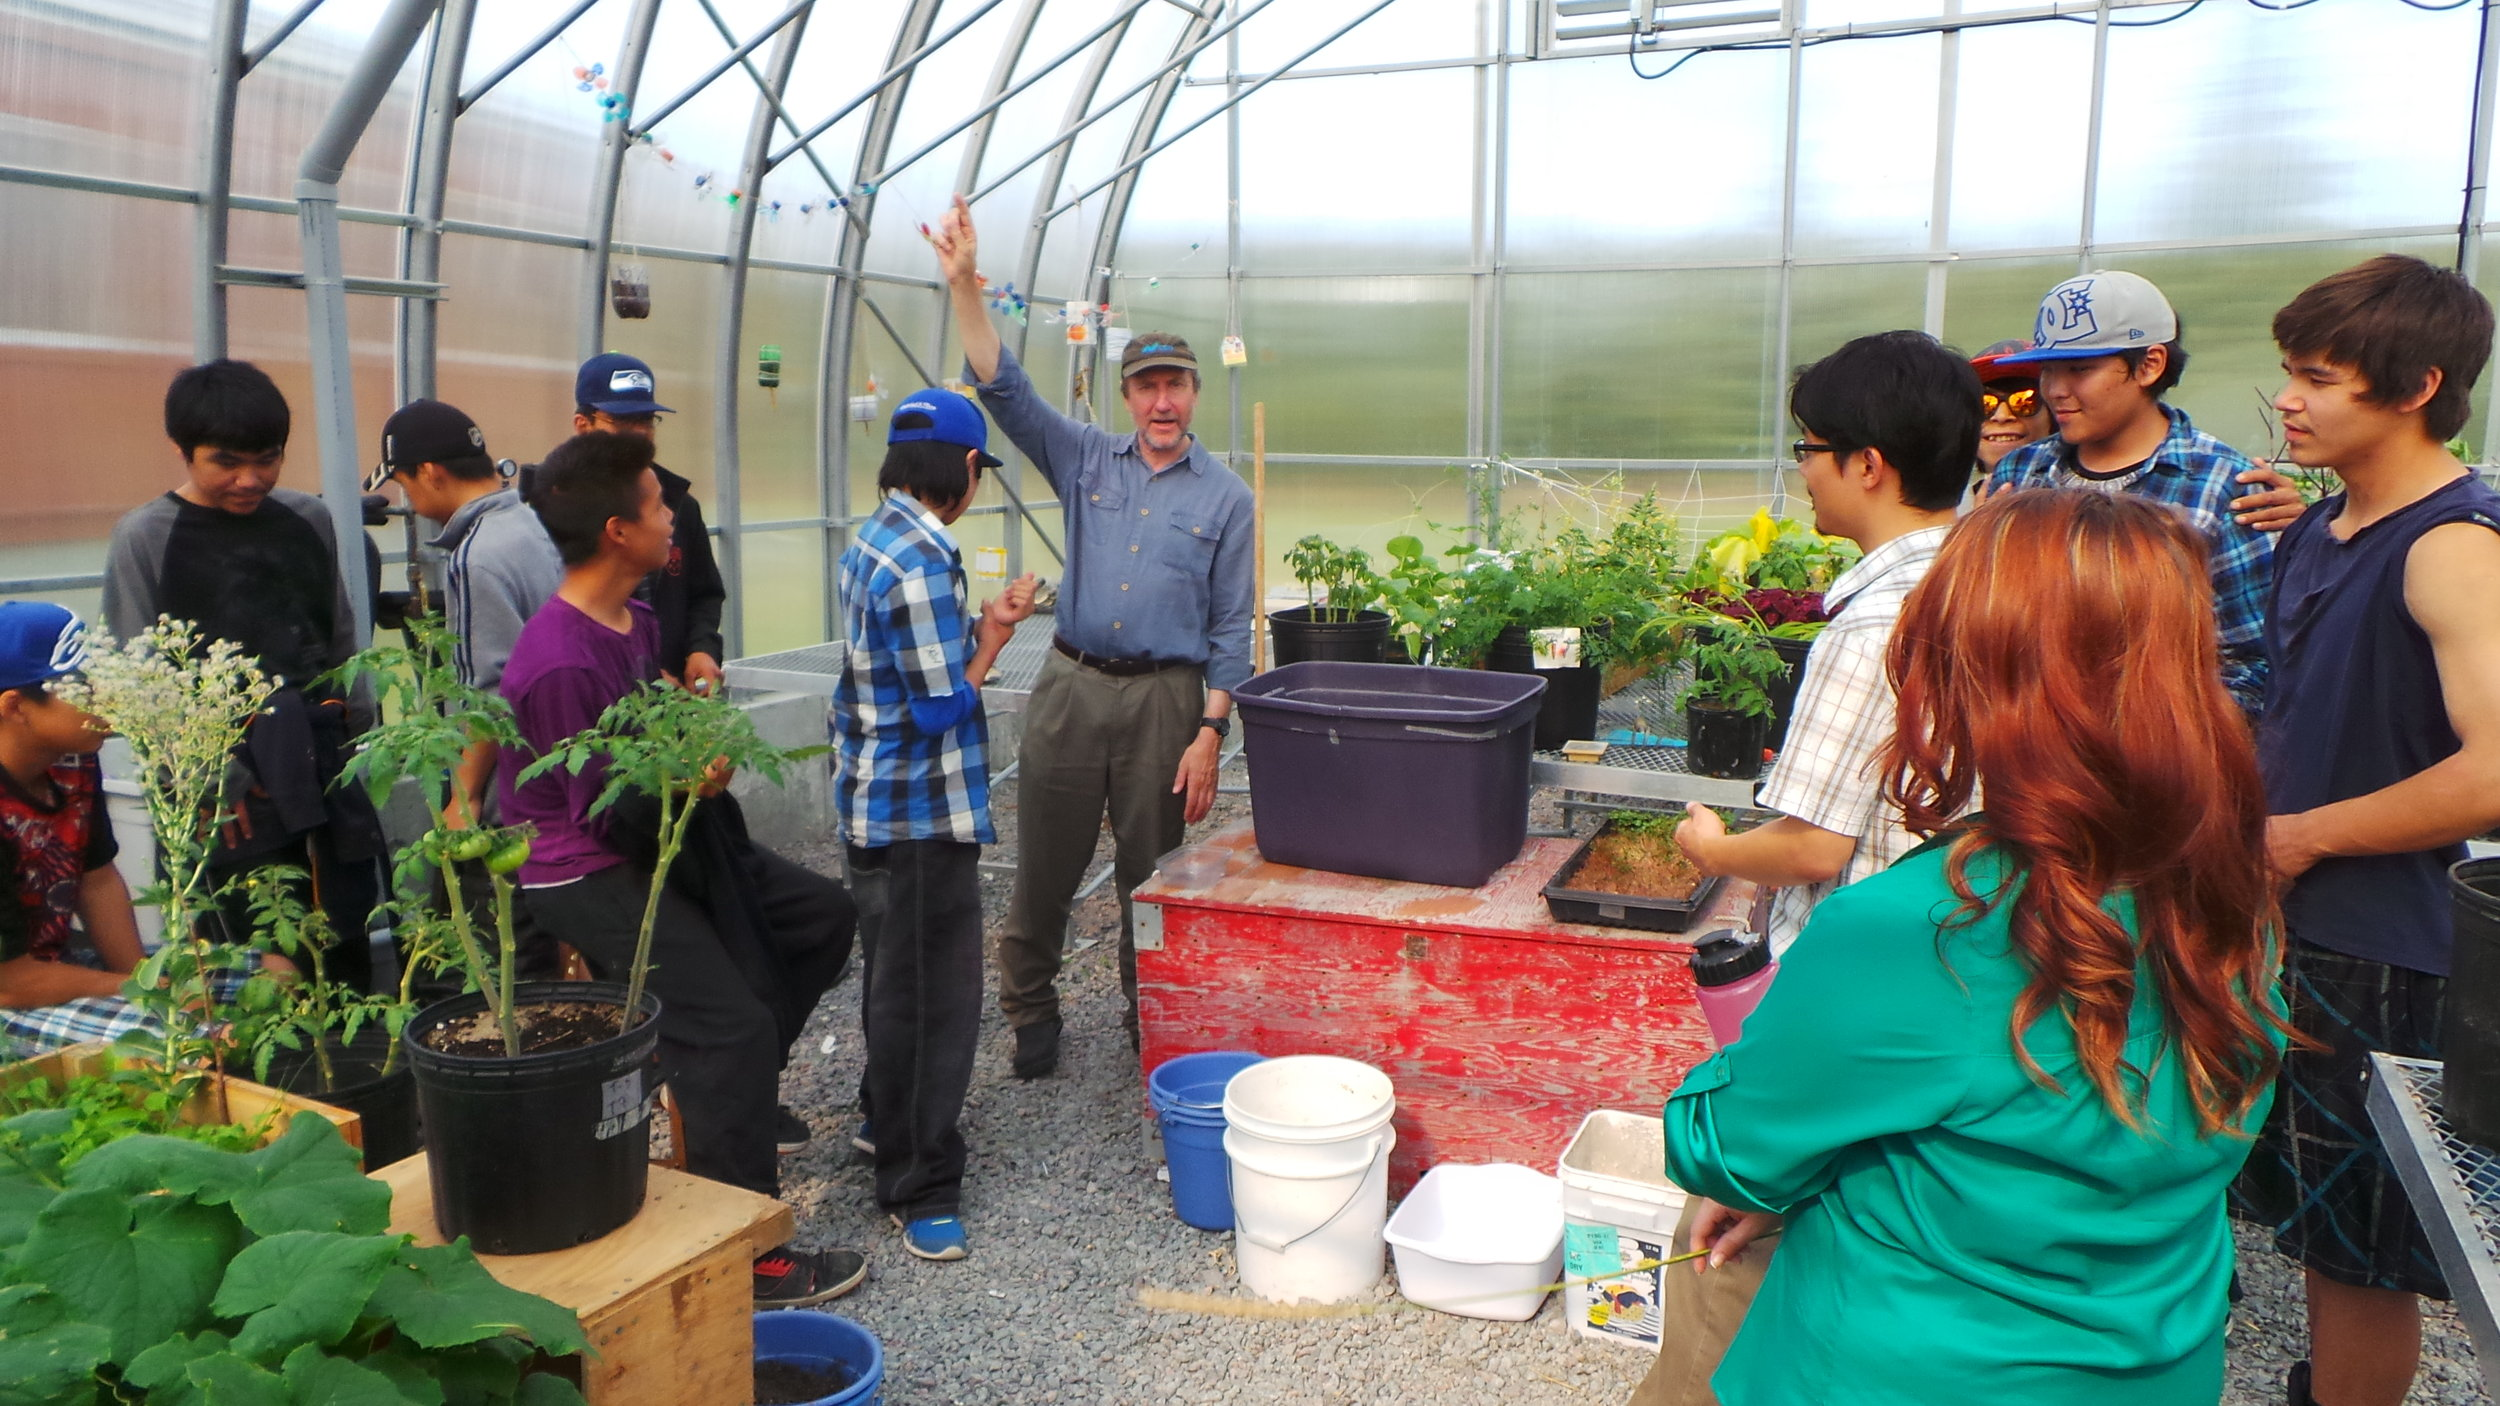 Warwick Vincent leading science day at the Centre d'études nordiques science center in Whapmagoostui-Kuujjuarapik